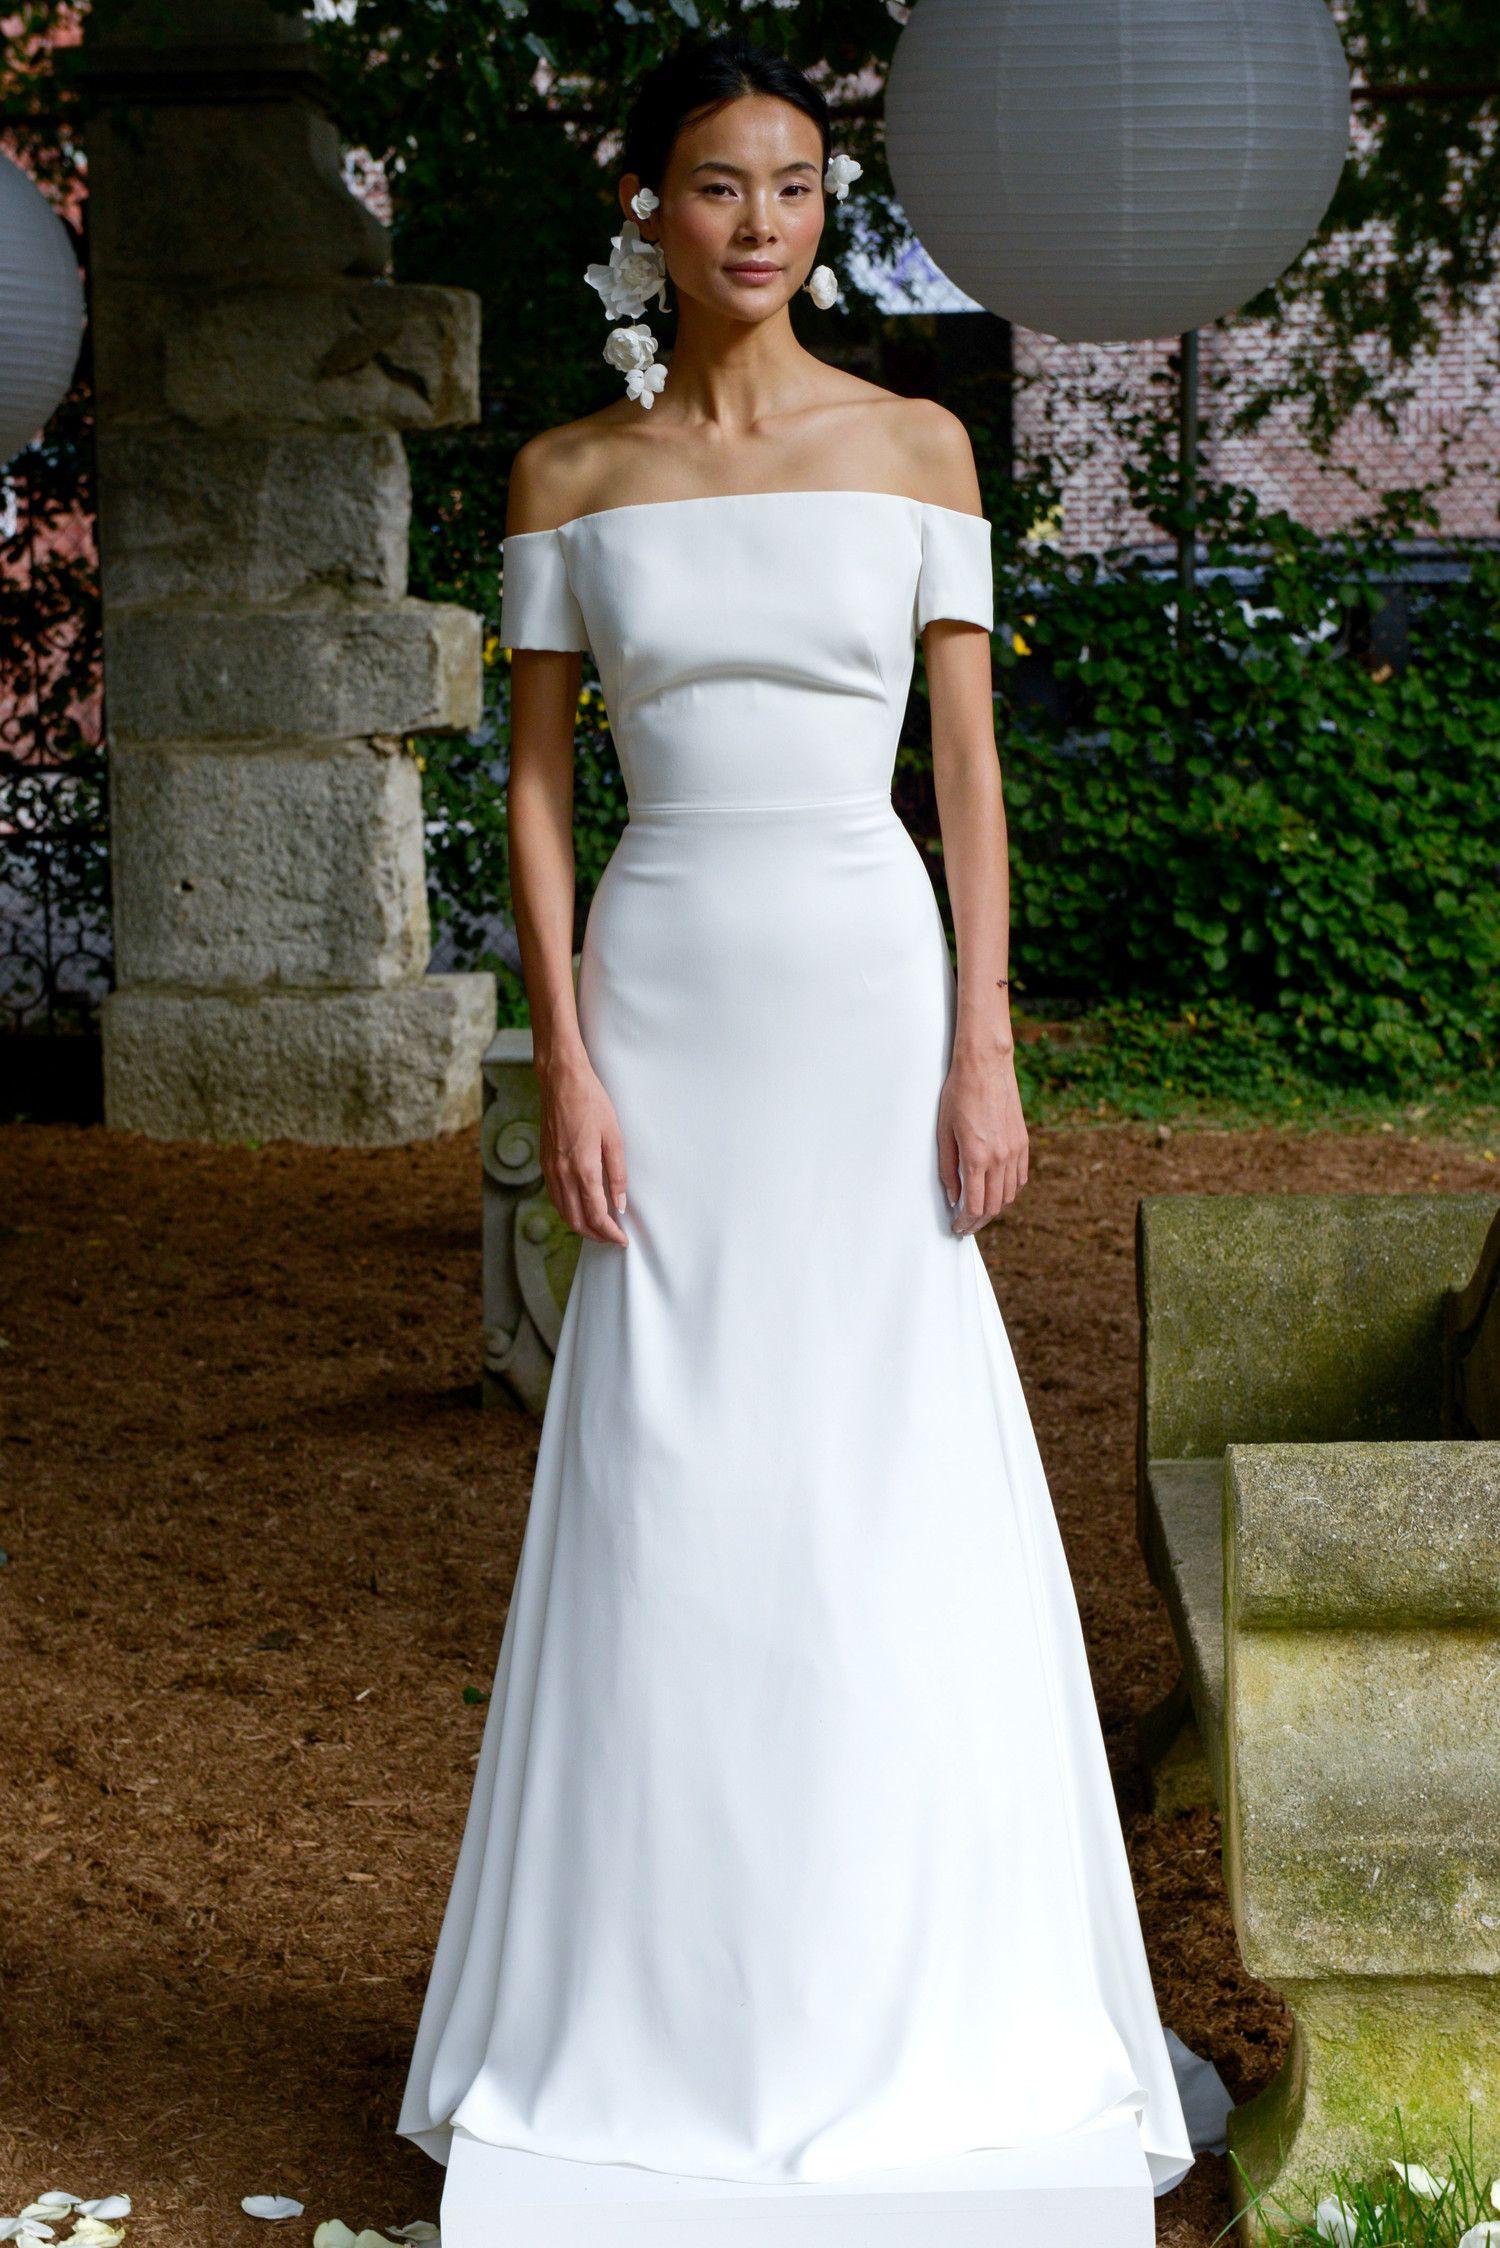 Simple elegant wedding dress designers  Simple Wedding Dresses That Are Just Plain Chic  Wedding Dresses